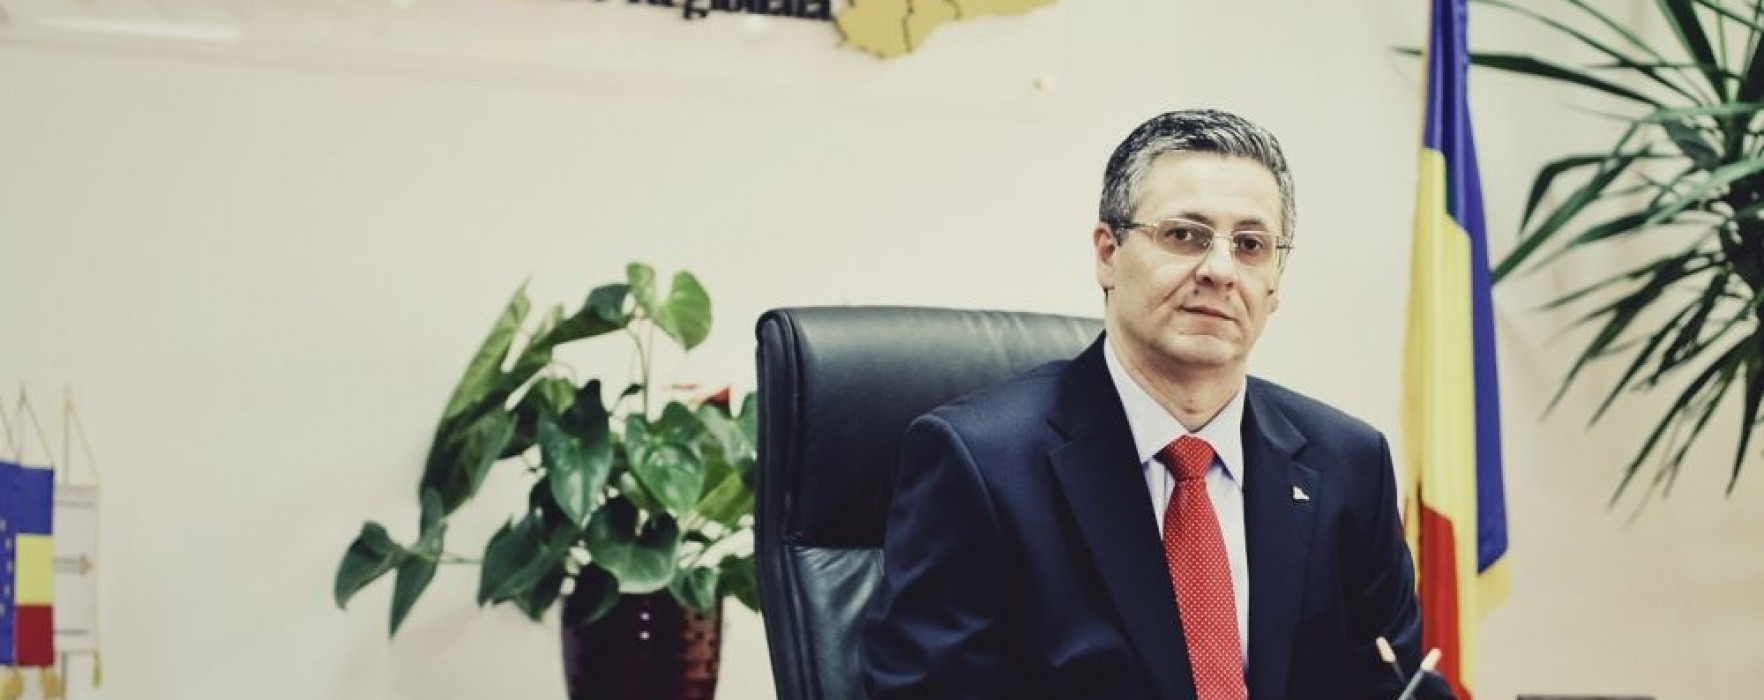 DNA: Directorul ADR Sud Muntenia, Liviu Muşat, sub control judiciar